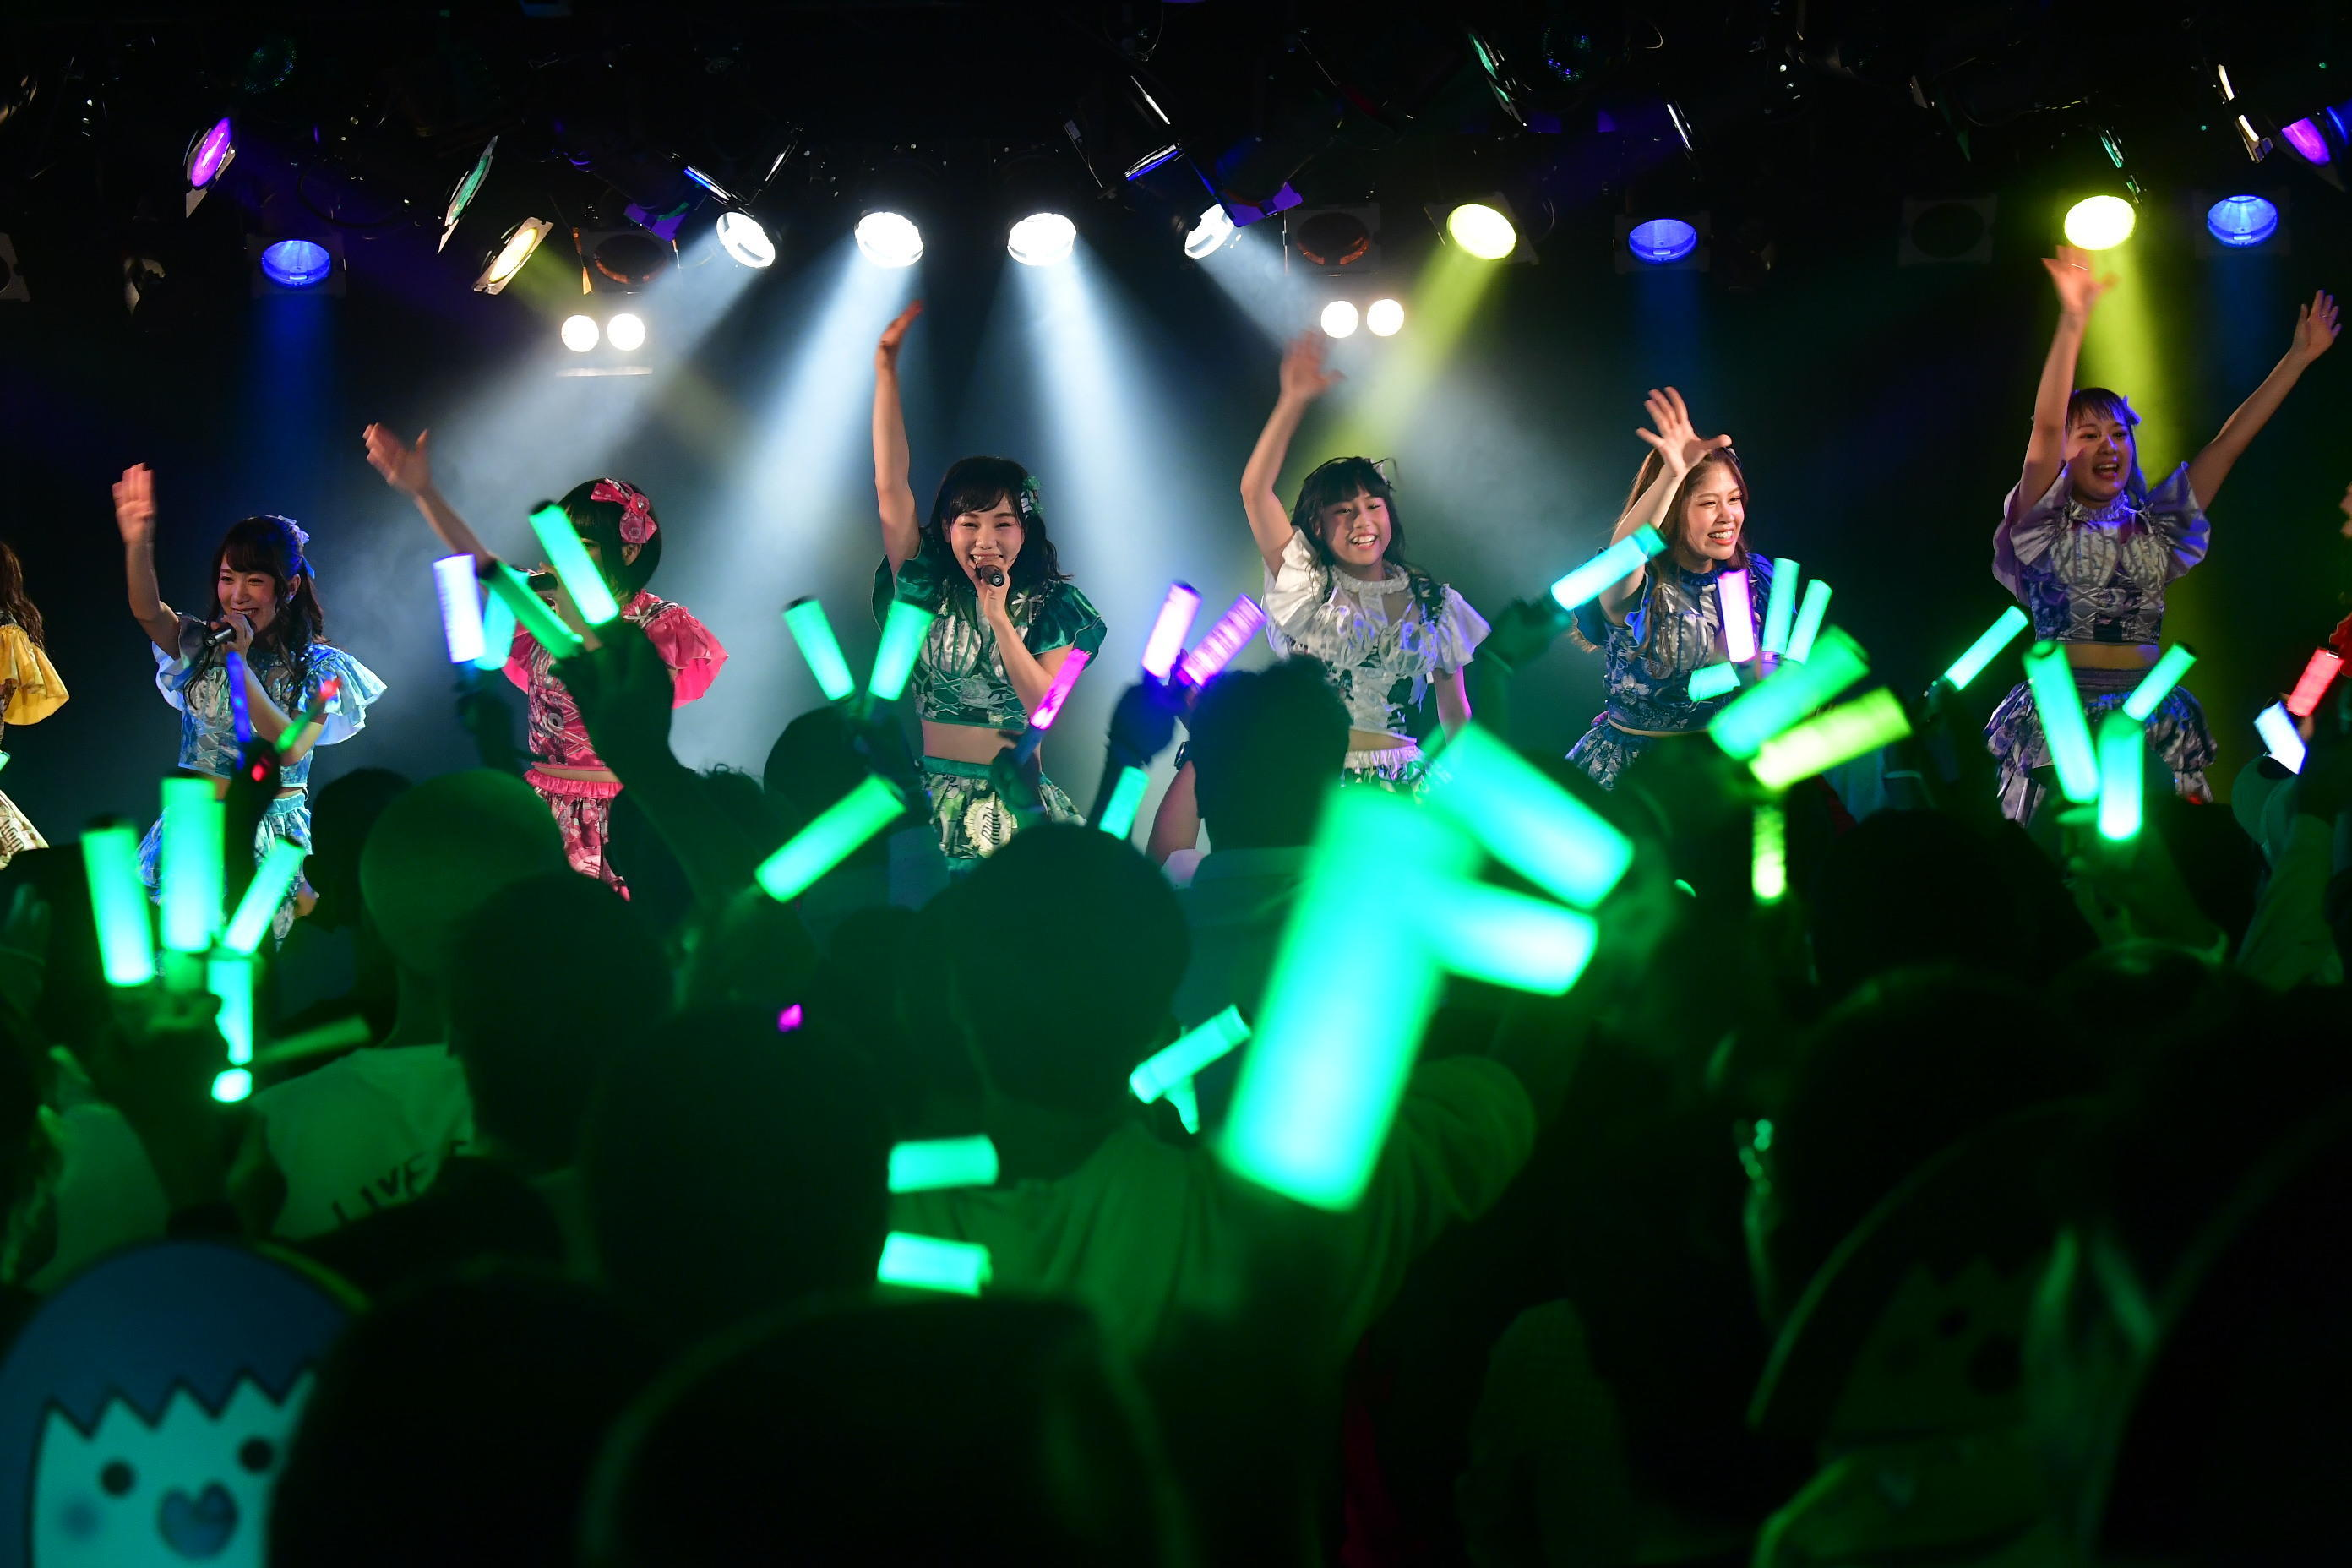 http://news.yoshimoto.co.jp/20181108183035-0a8494bc3e5846f3f5d09ecee80351def89ad410.jpg